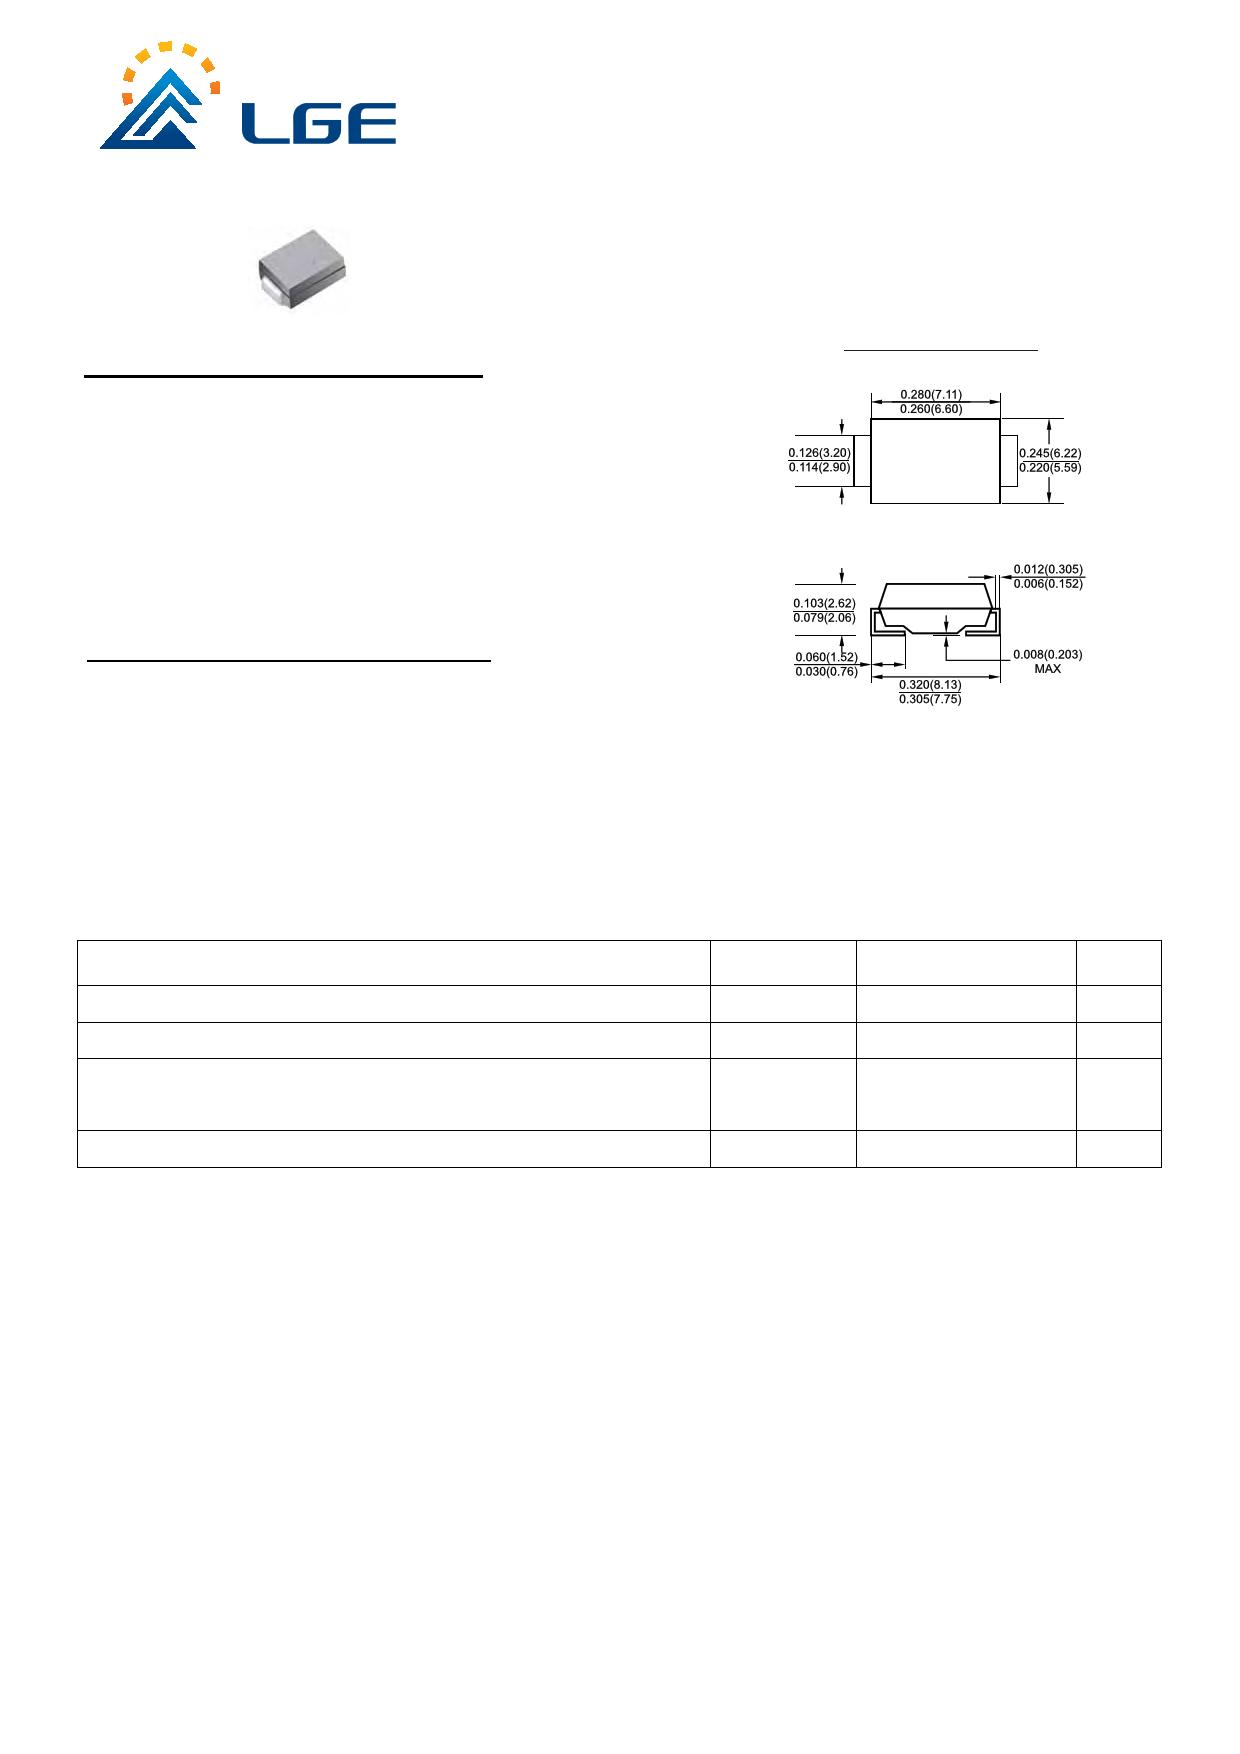 3.0SMCJ20CA Datasheet, 3.0SMCJ20CA PDF,ピン配置, 機能